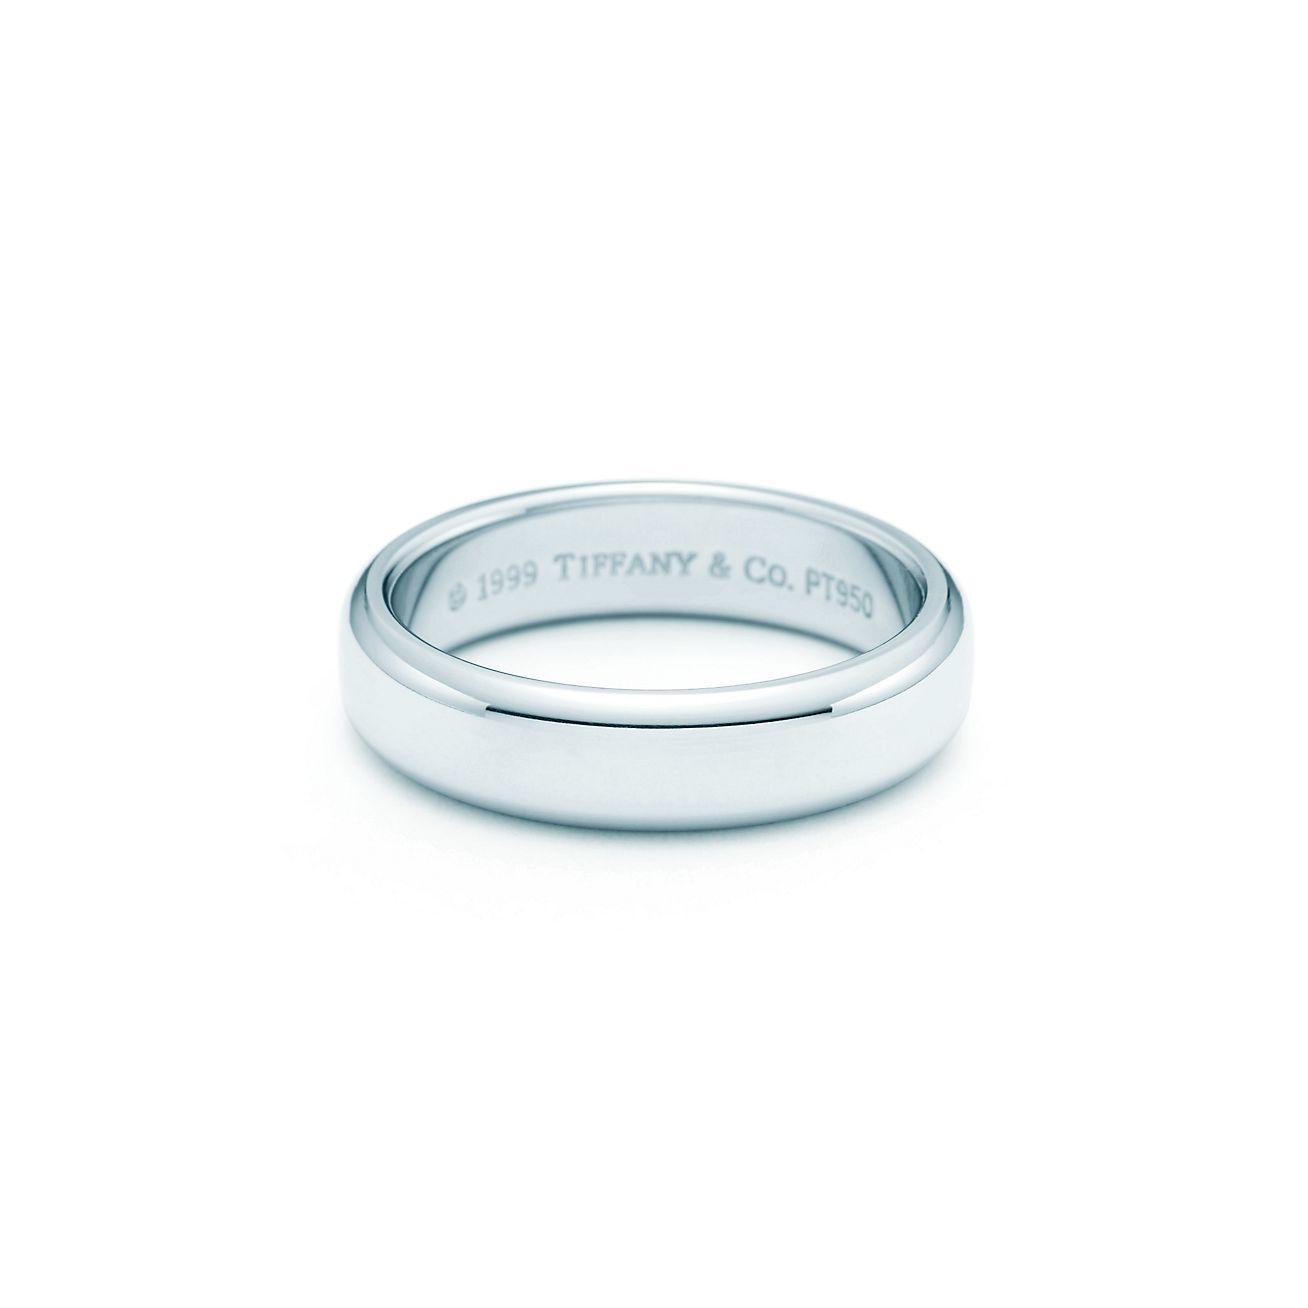 tiffany classicwedding band ring